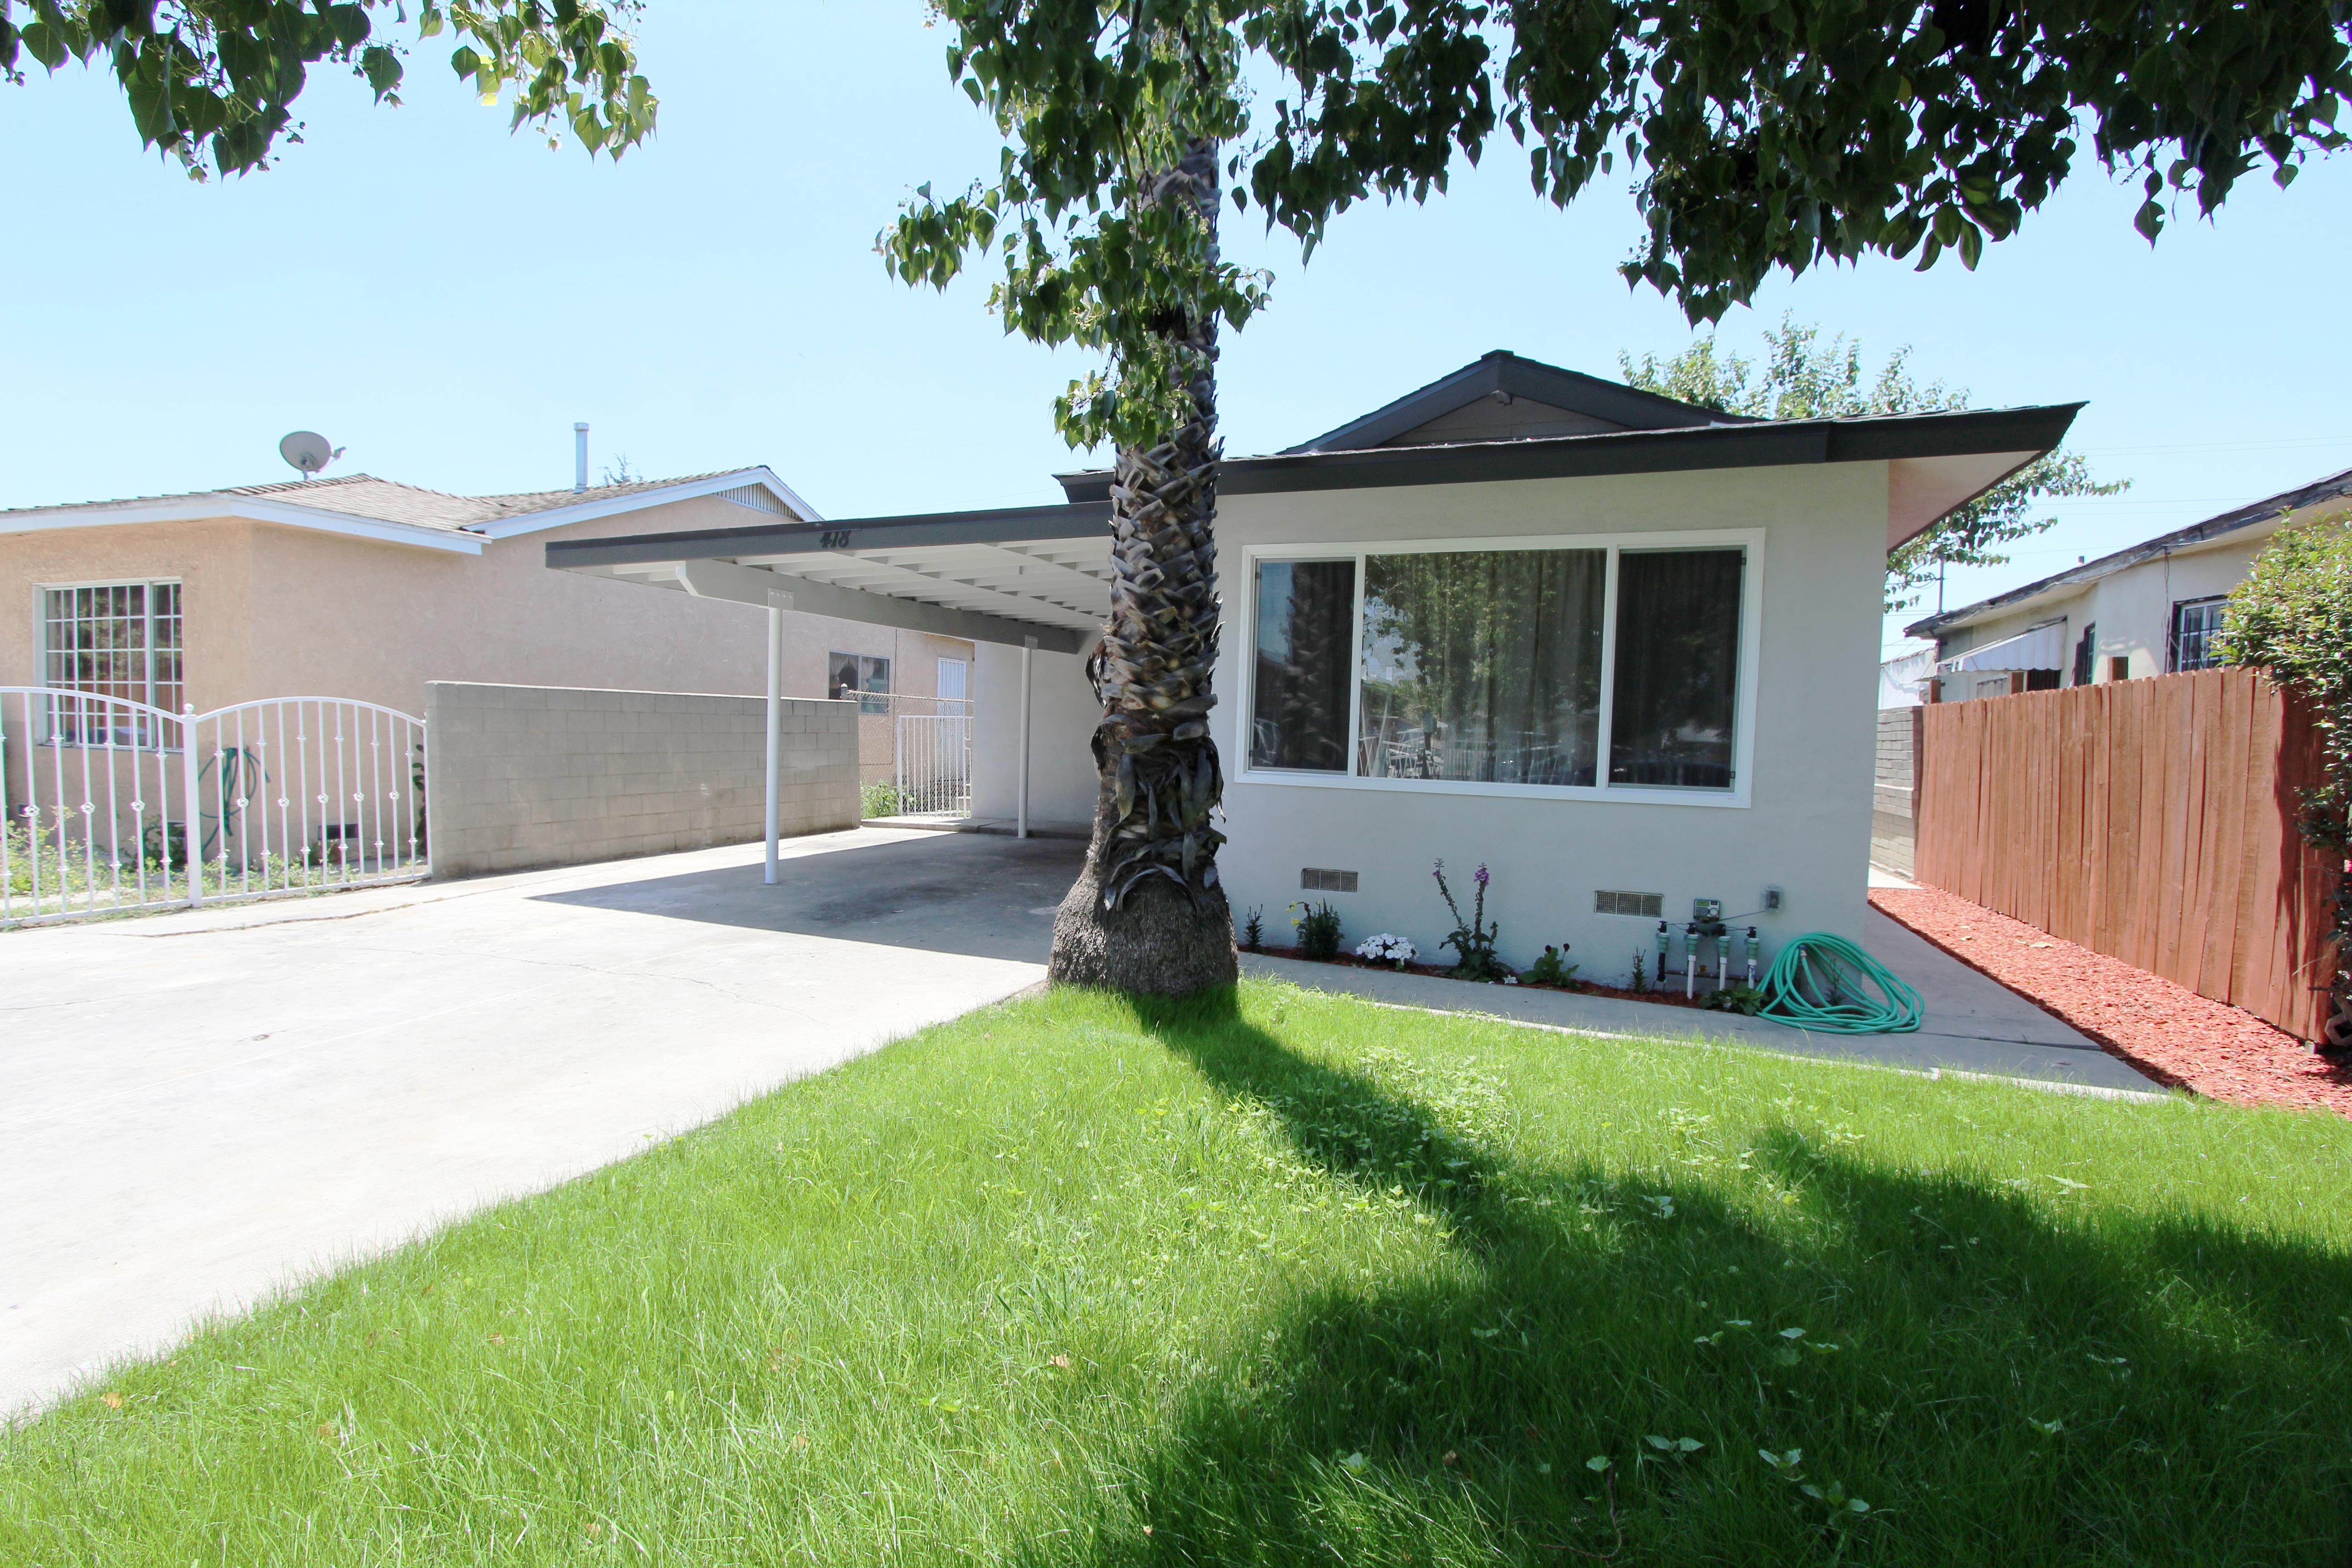 418 E 93RD ST., LOS ANGELES 90003